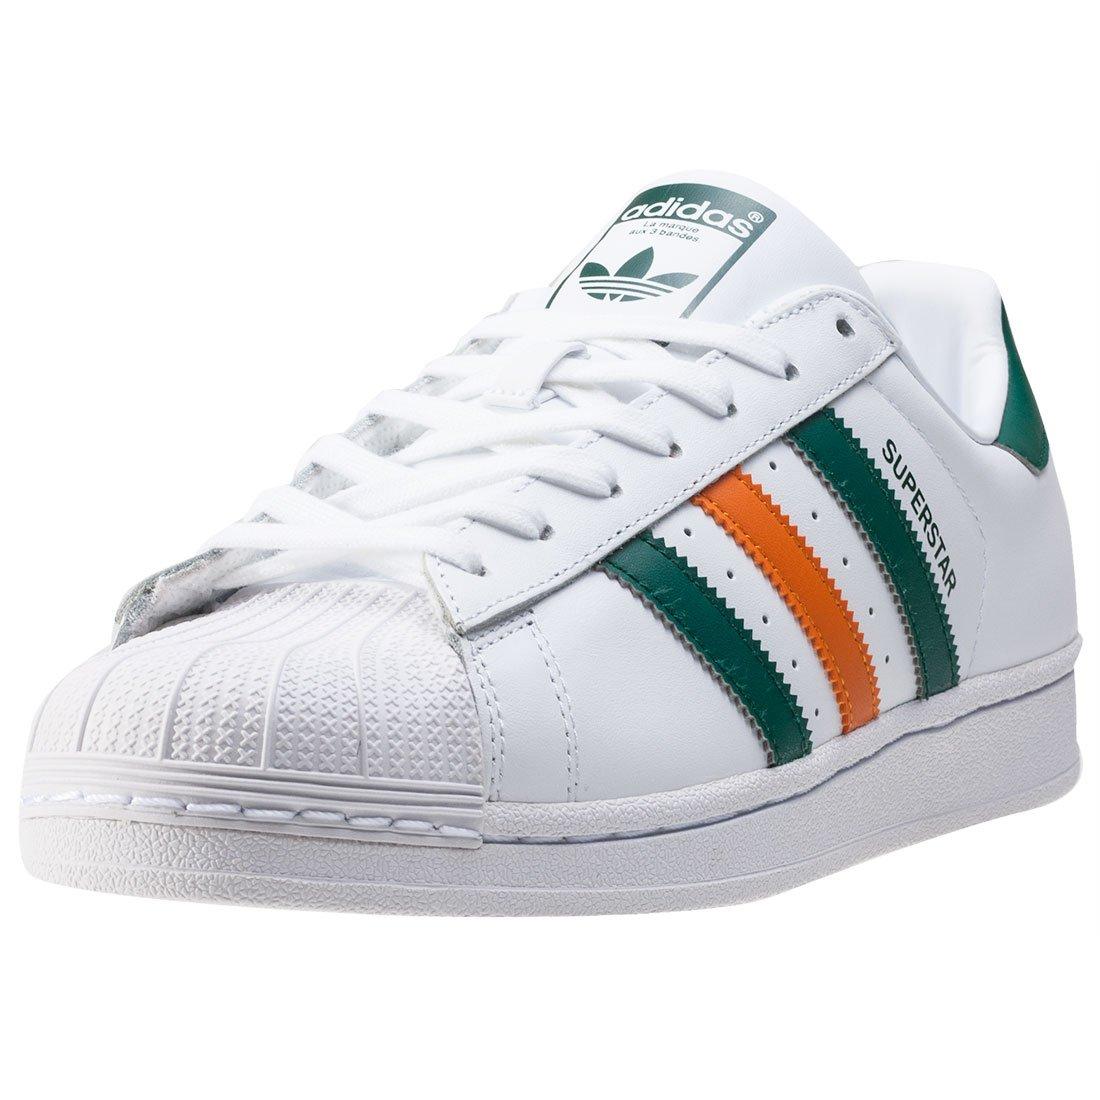 adidas Superstar White Green Orange 48.5  Amazon.co.uk  Shoes   Bags 85f486855d